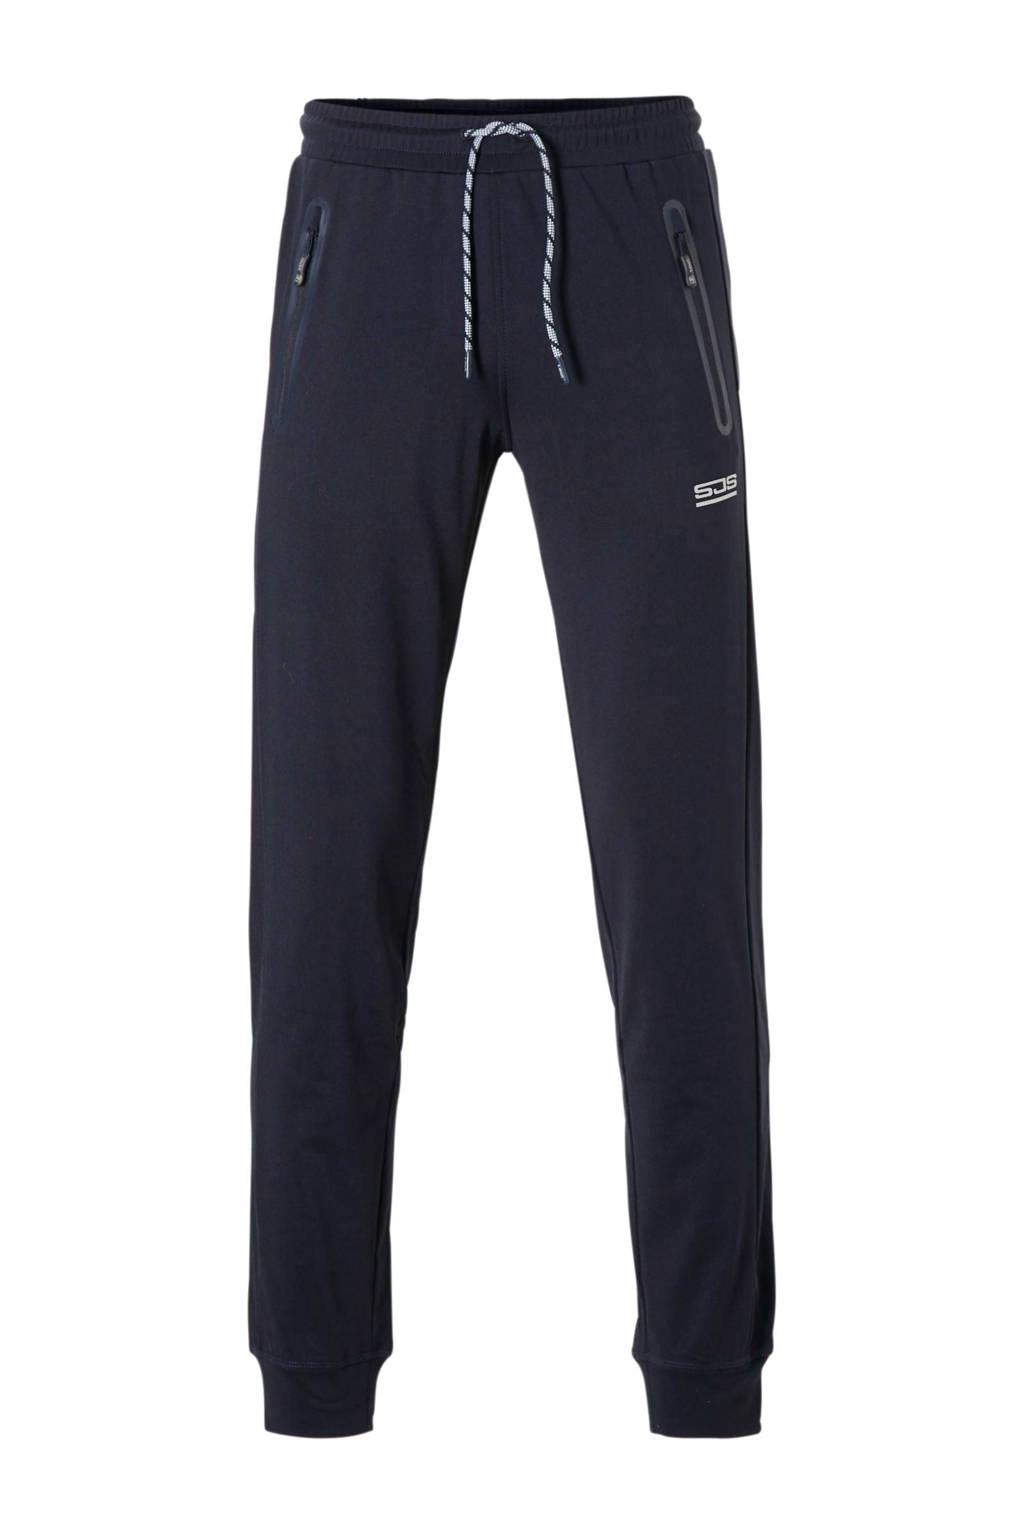 Sjeng Sports   joggingbroek Presto donkerblauw, Donkerblauw